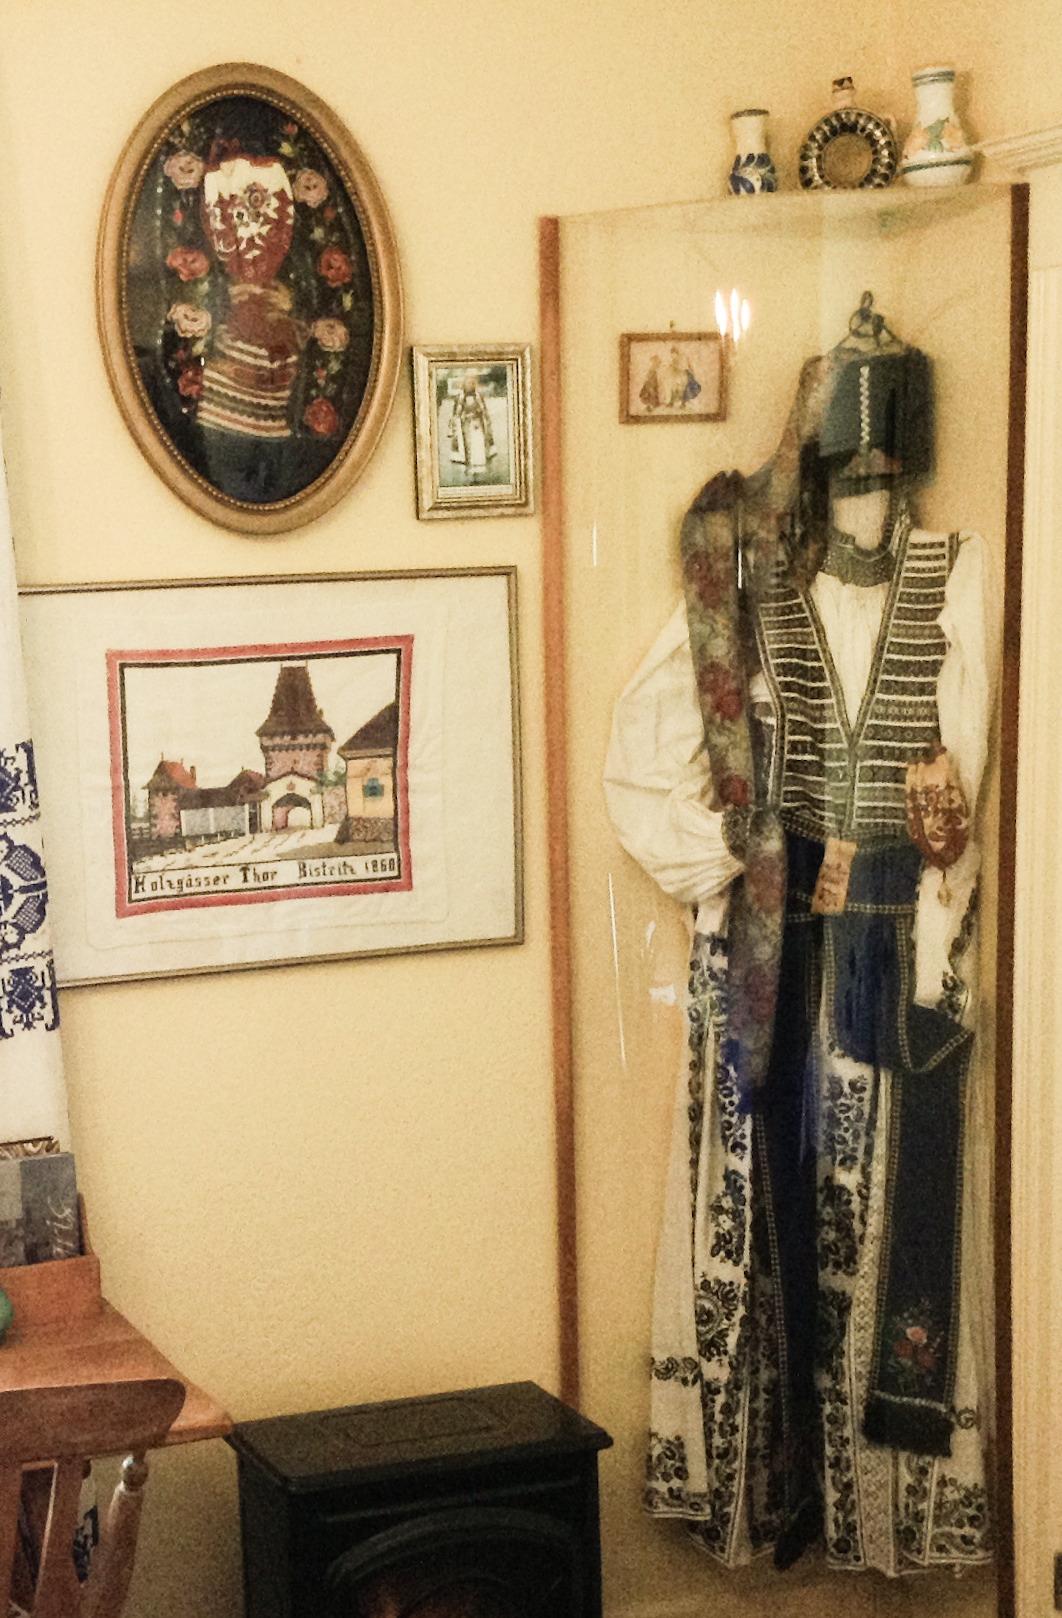 Transylvanian Festive Costume worn by Saxon Germans